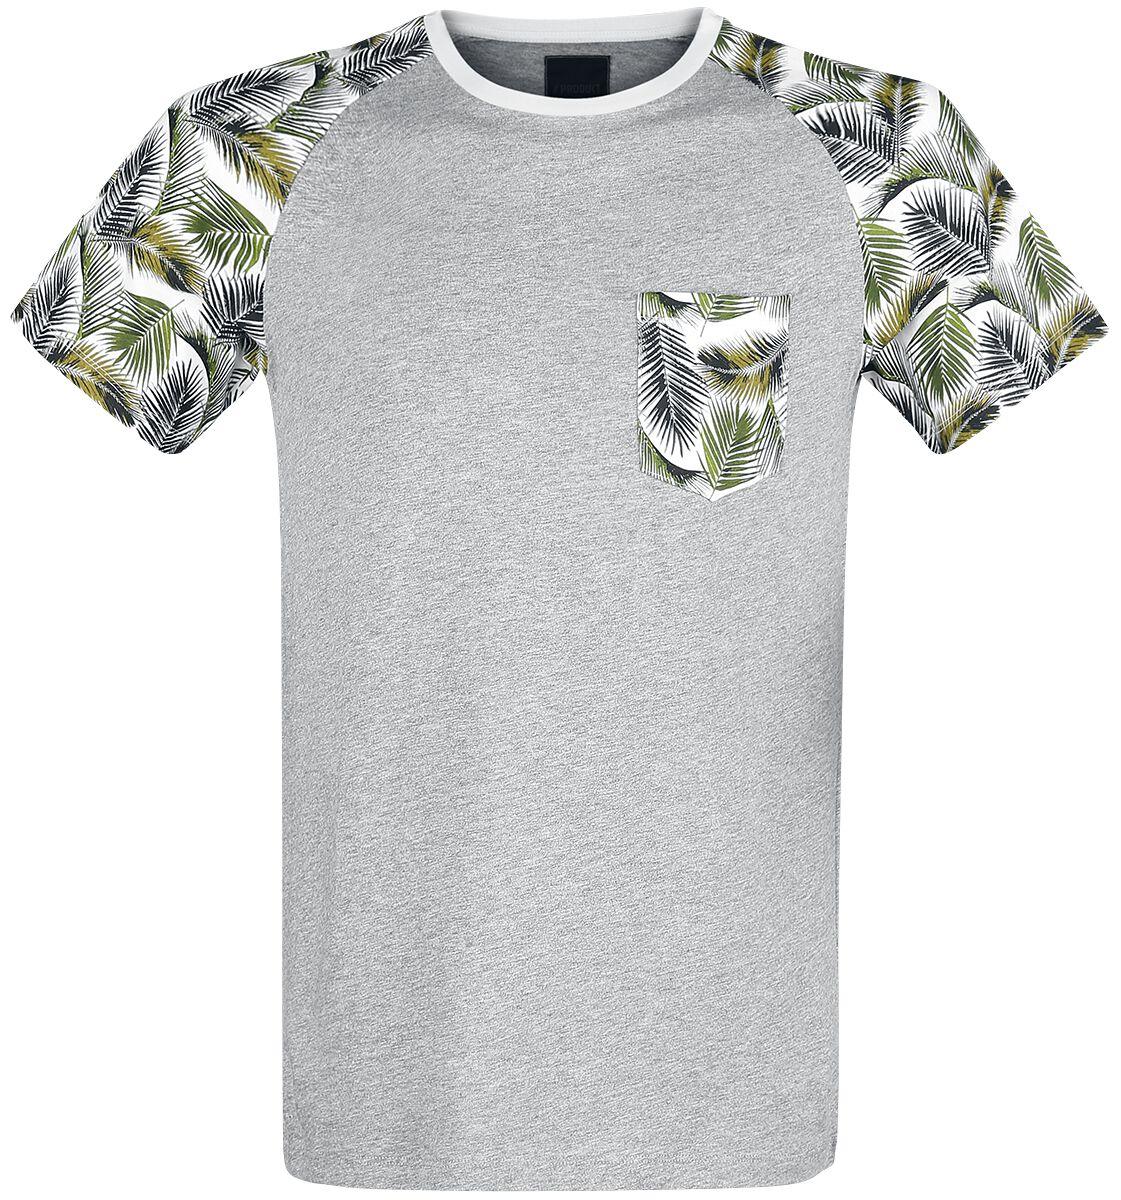 Marki - Koszulki - T-Shirt Produkt Palm Raglan Tee T-Shirt jasnoszary - 365802